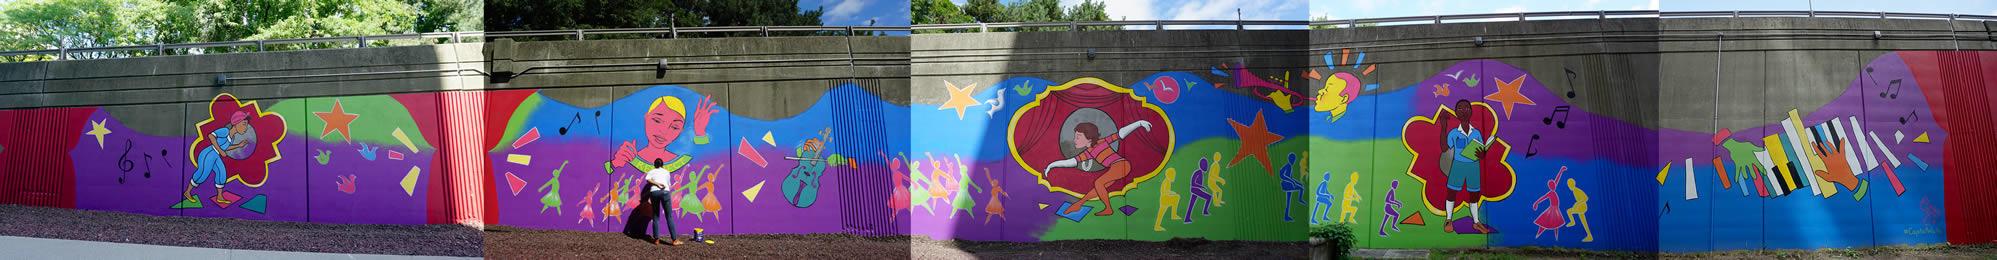 Liz Zunon downtown Albany mural composite pano